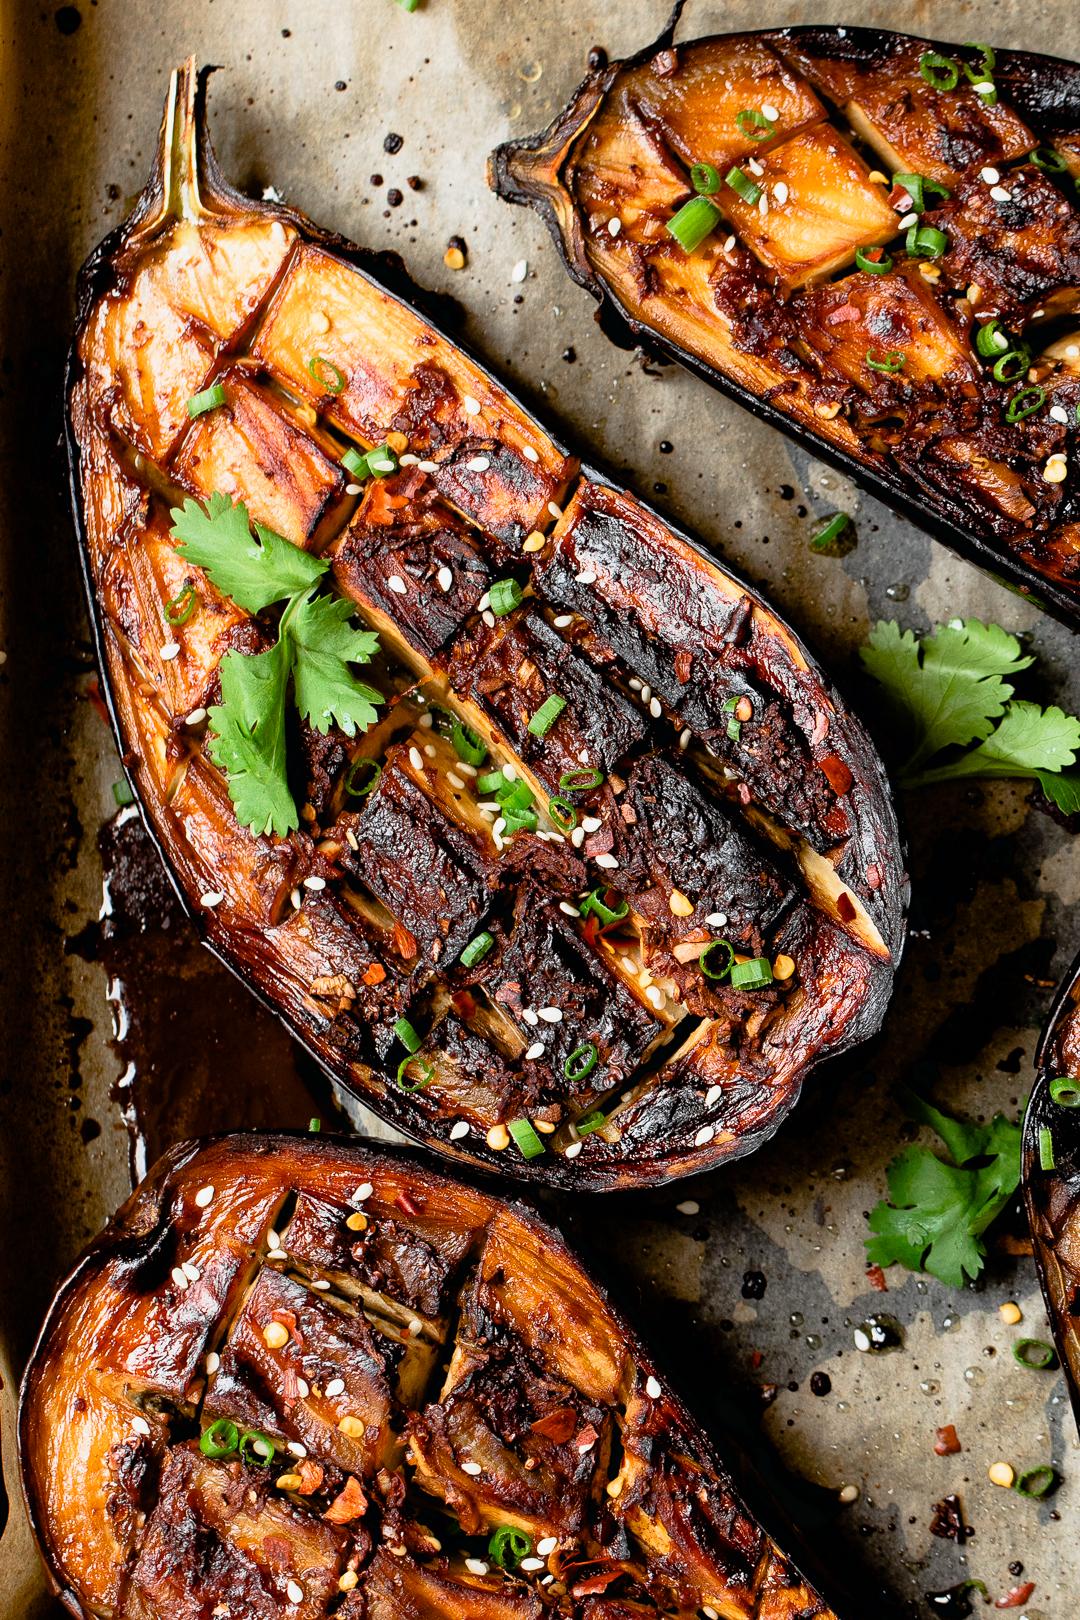 Ginger_Miso_Glazed_Eggplant2_by_Jordan_Pie_Nutritionist_Photographer-1.jpg